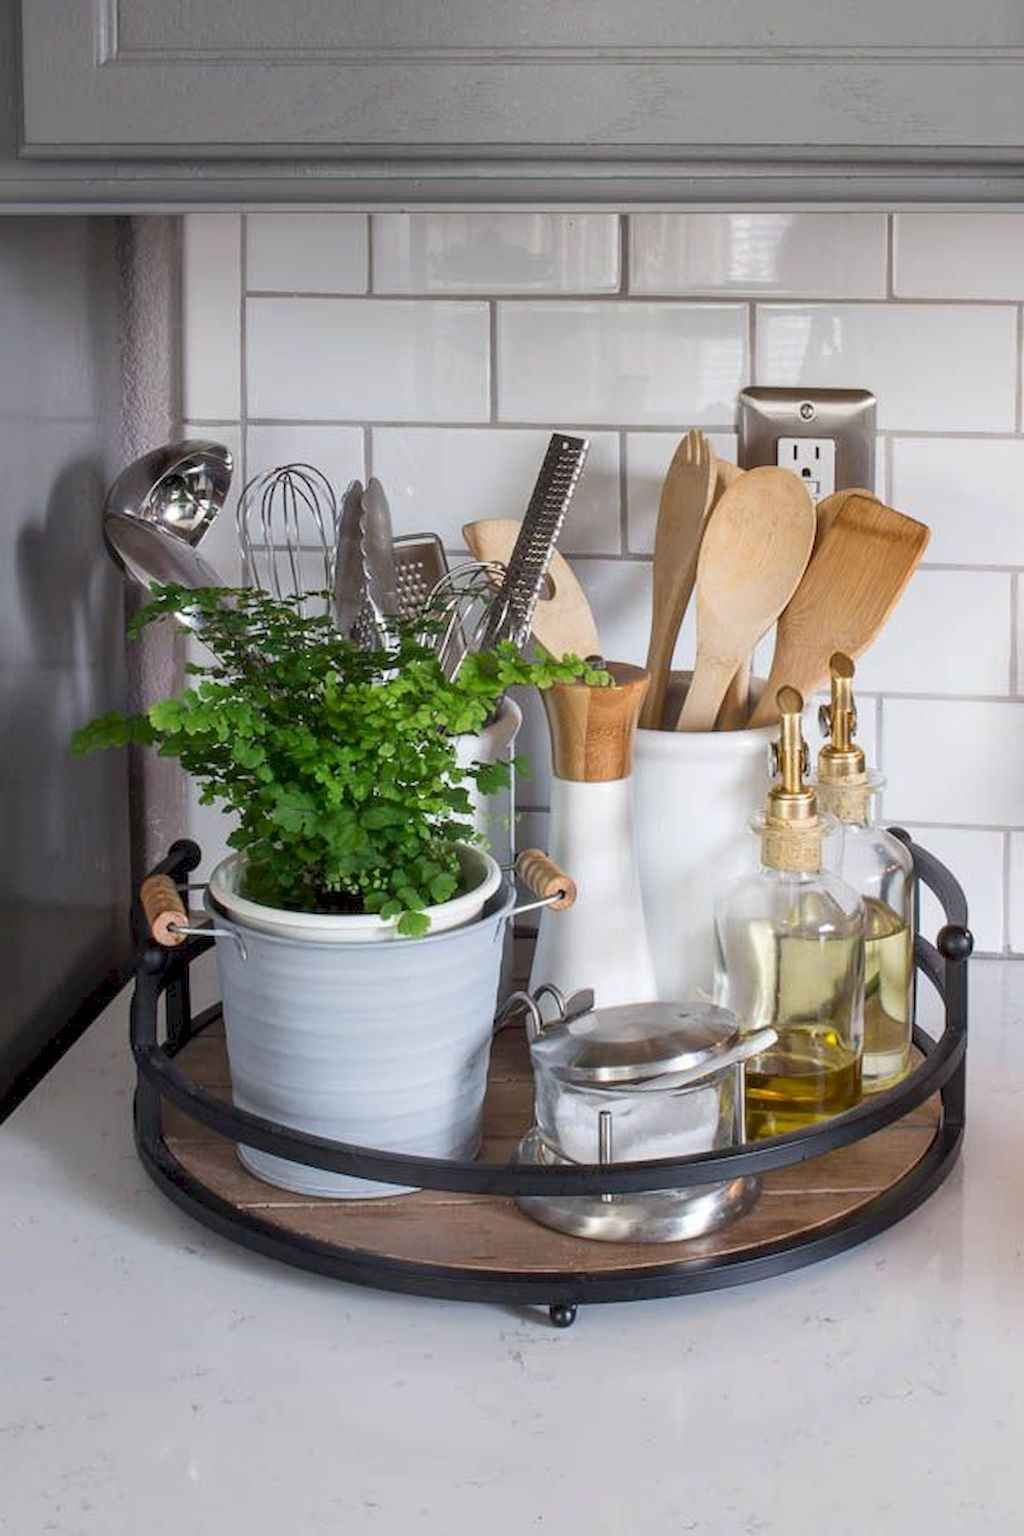 24 Smart Small Kitchen Organization and Tips Ideas - homixover.com #organizingsmallkitchens